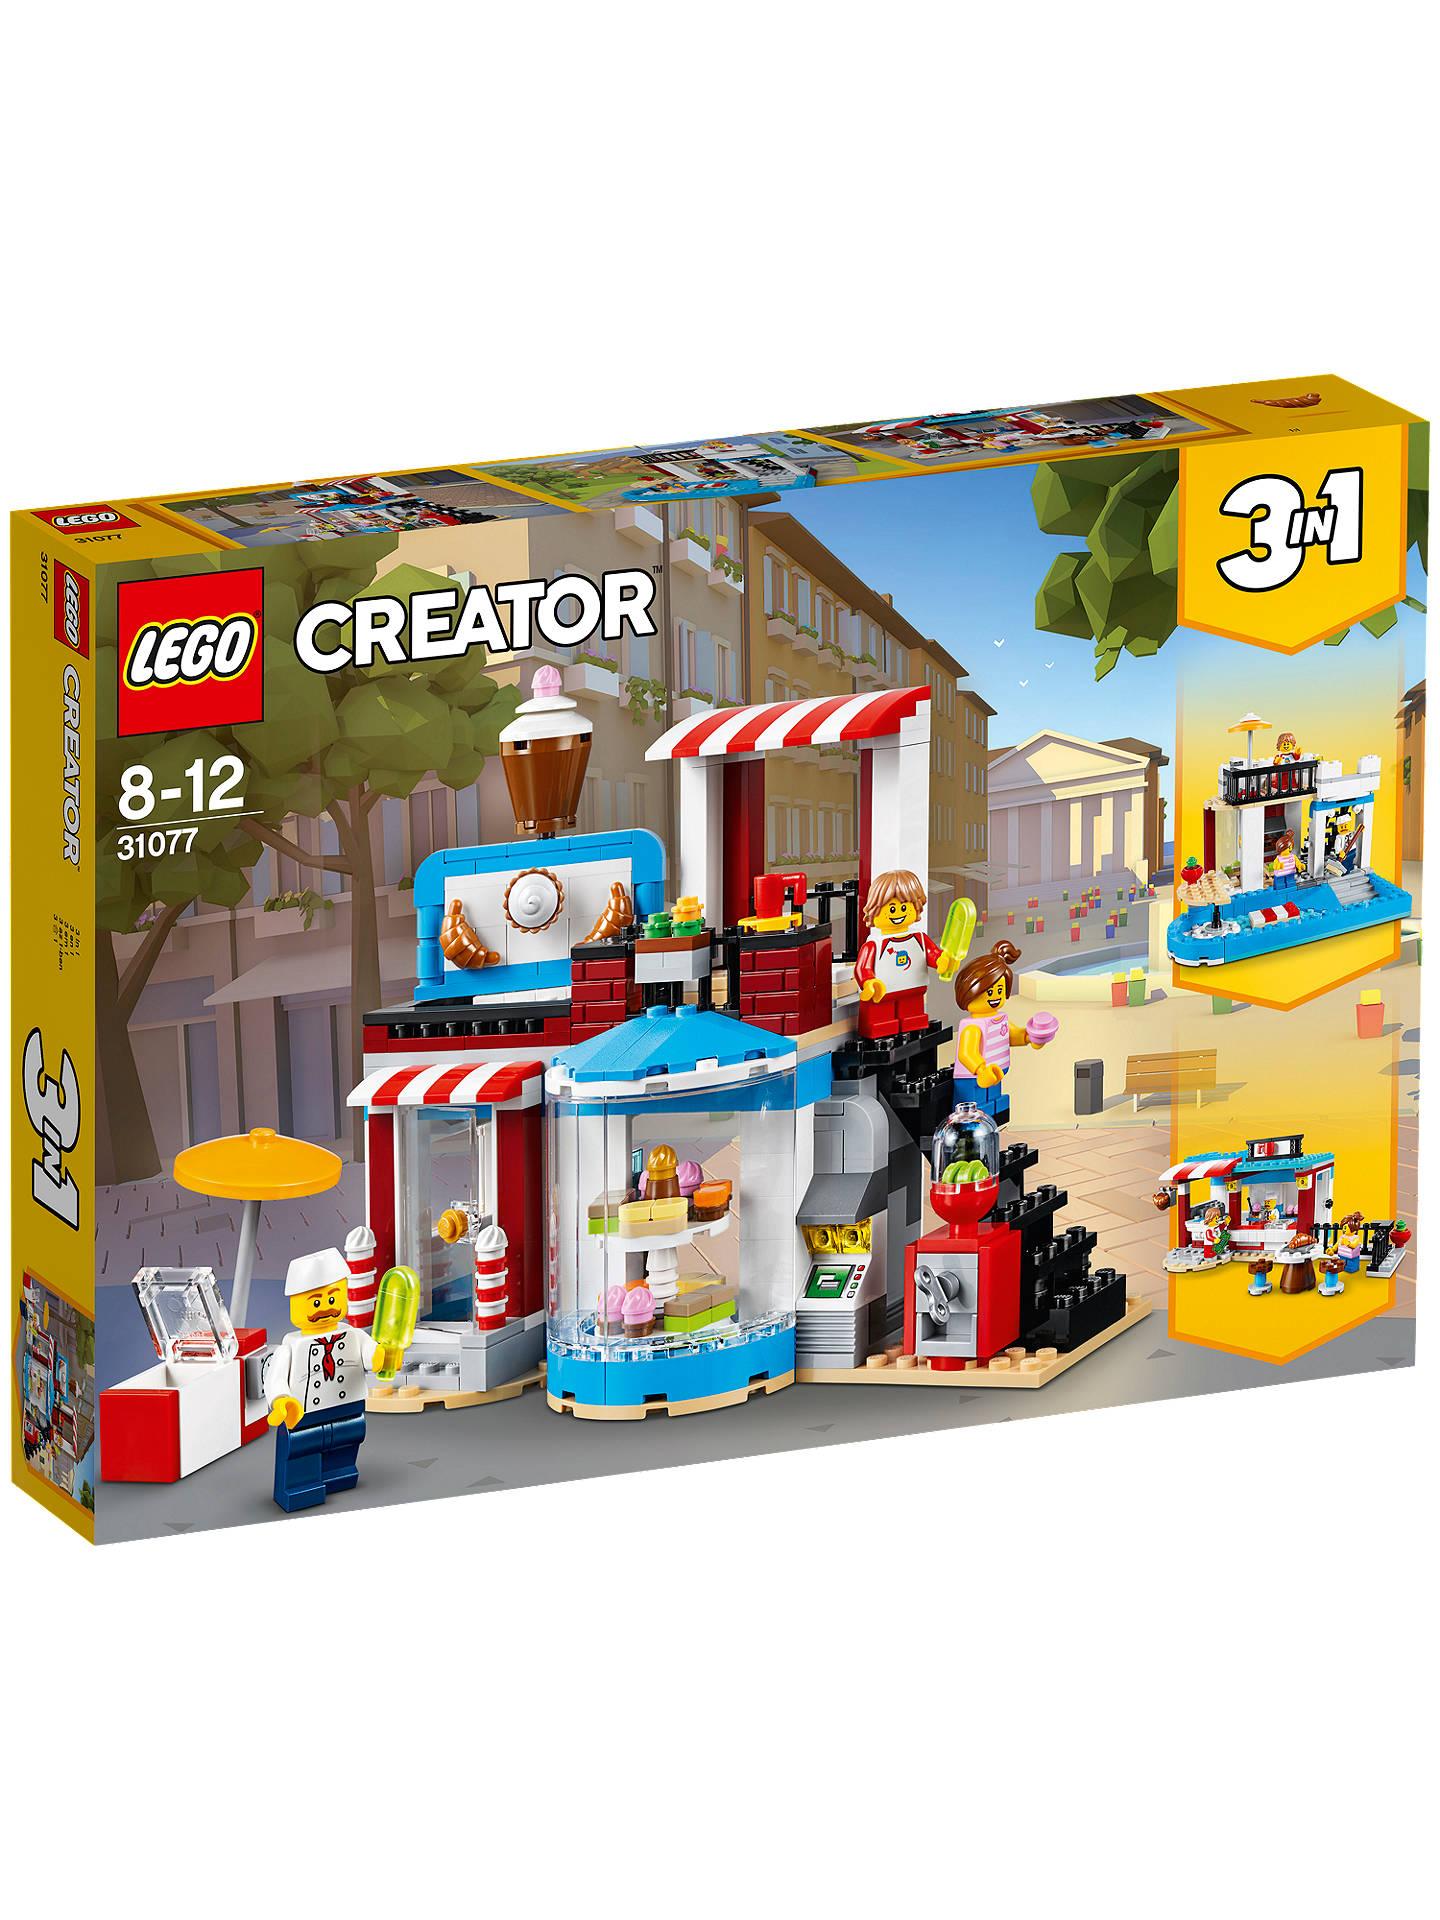 d3eaa7f504d Buy LEGO Creator 31077 3-in-1 Modul Sweet Surprises Online at johnlewis.